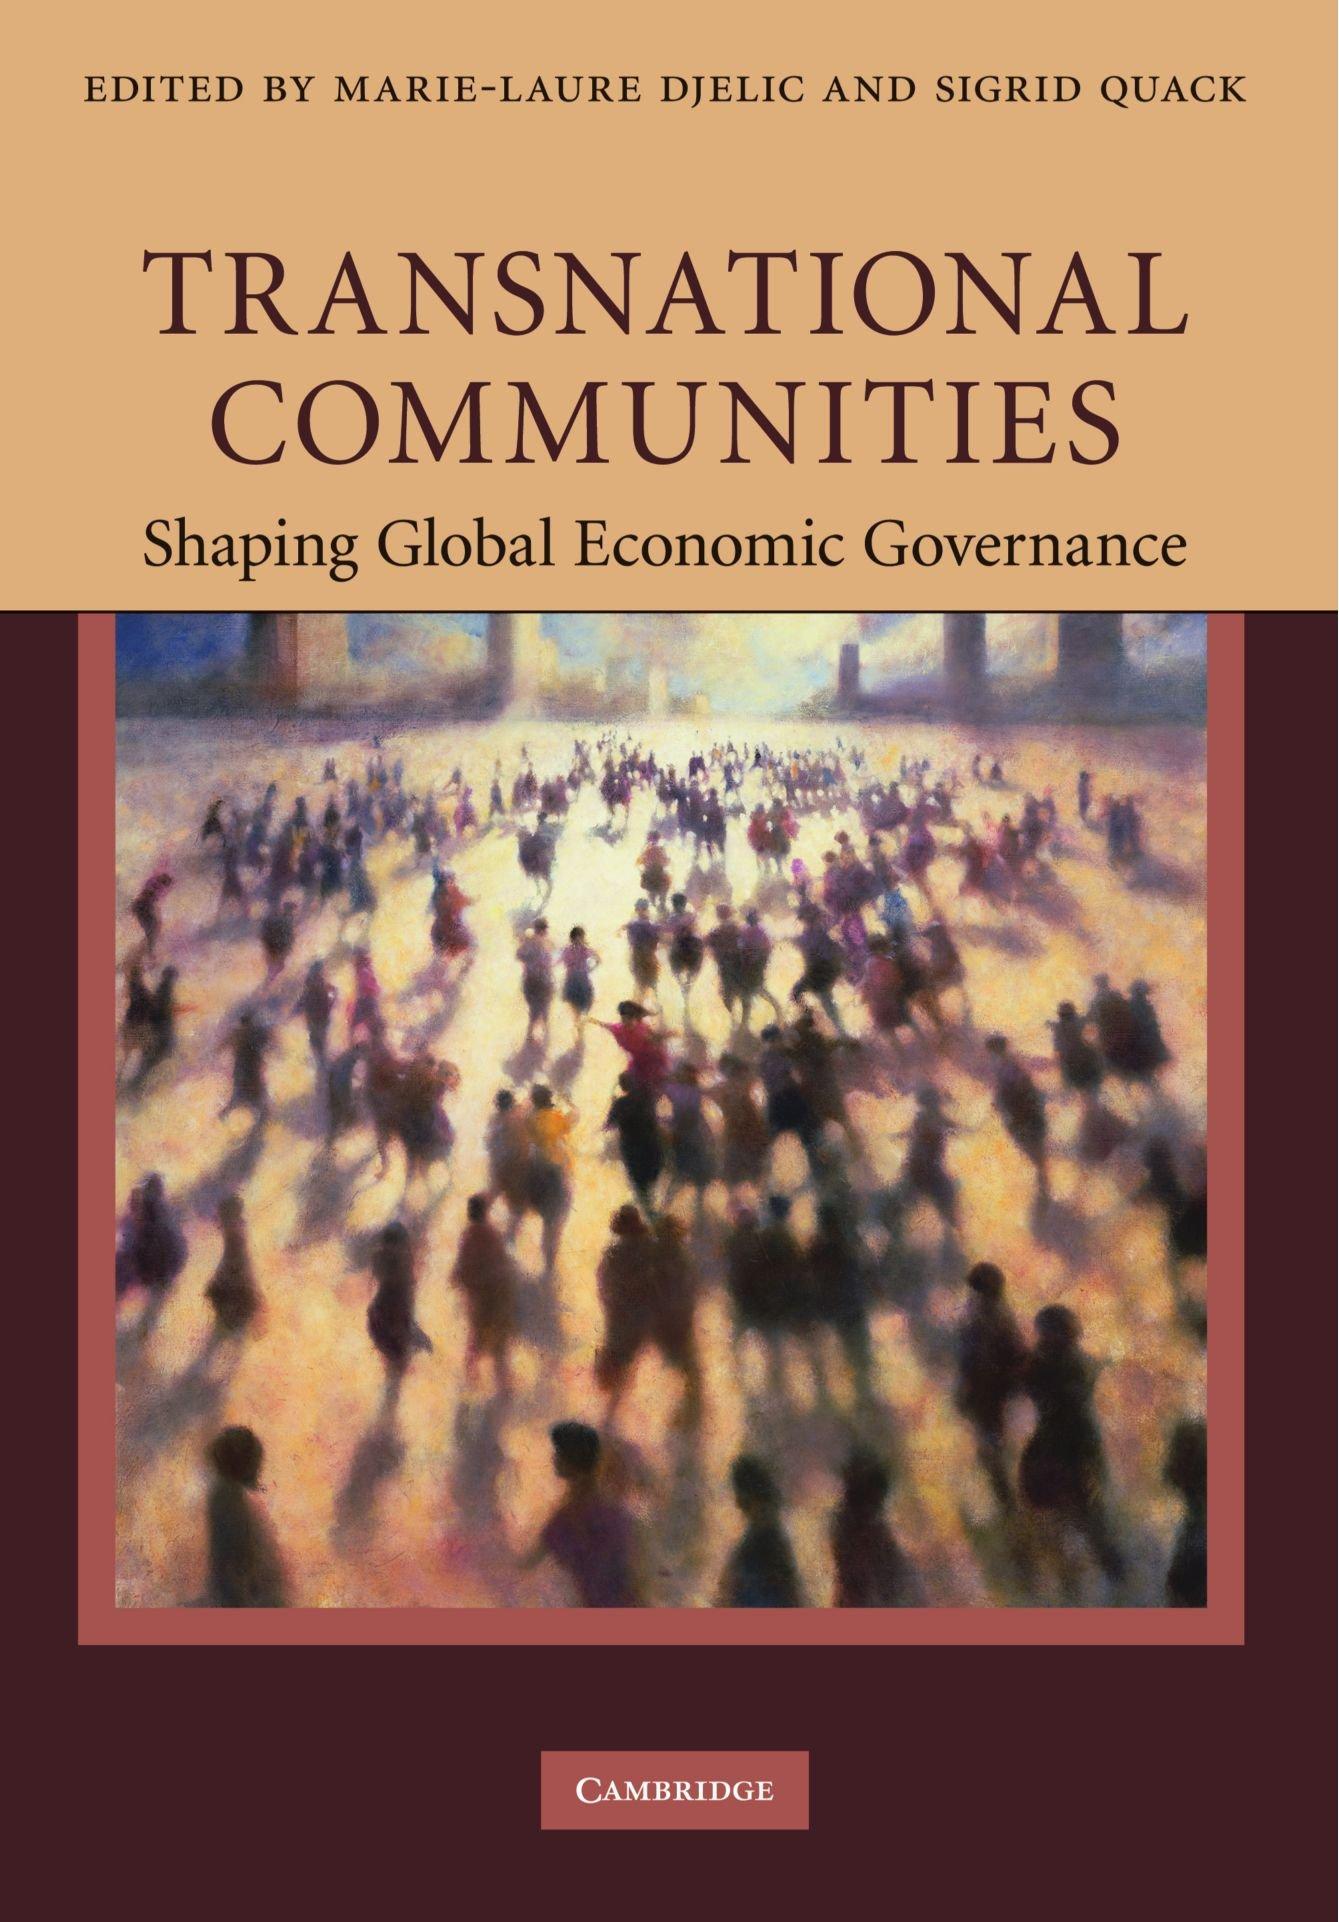 Download Transnational Communities: Shaping Global Economic Governance ebook